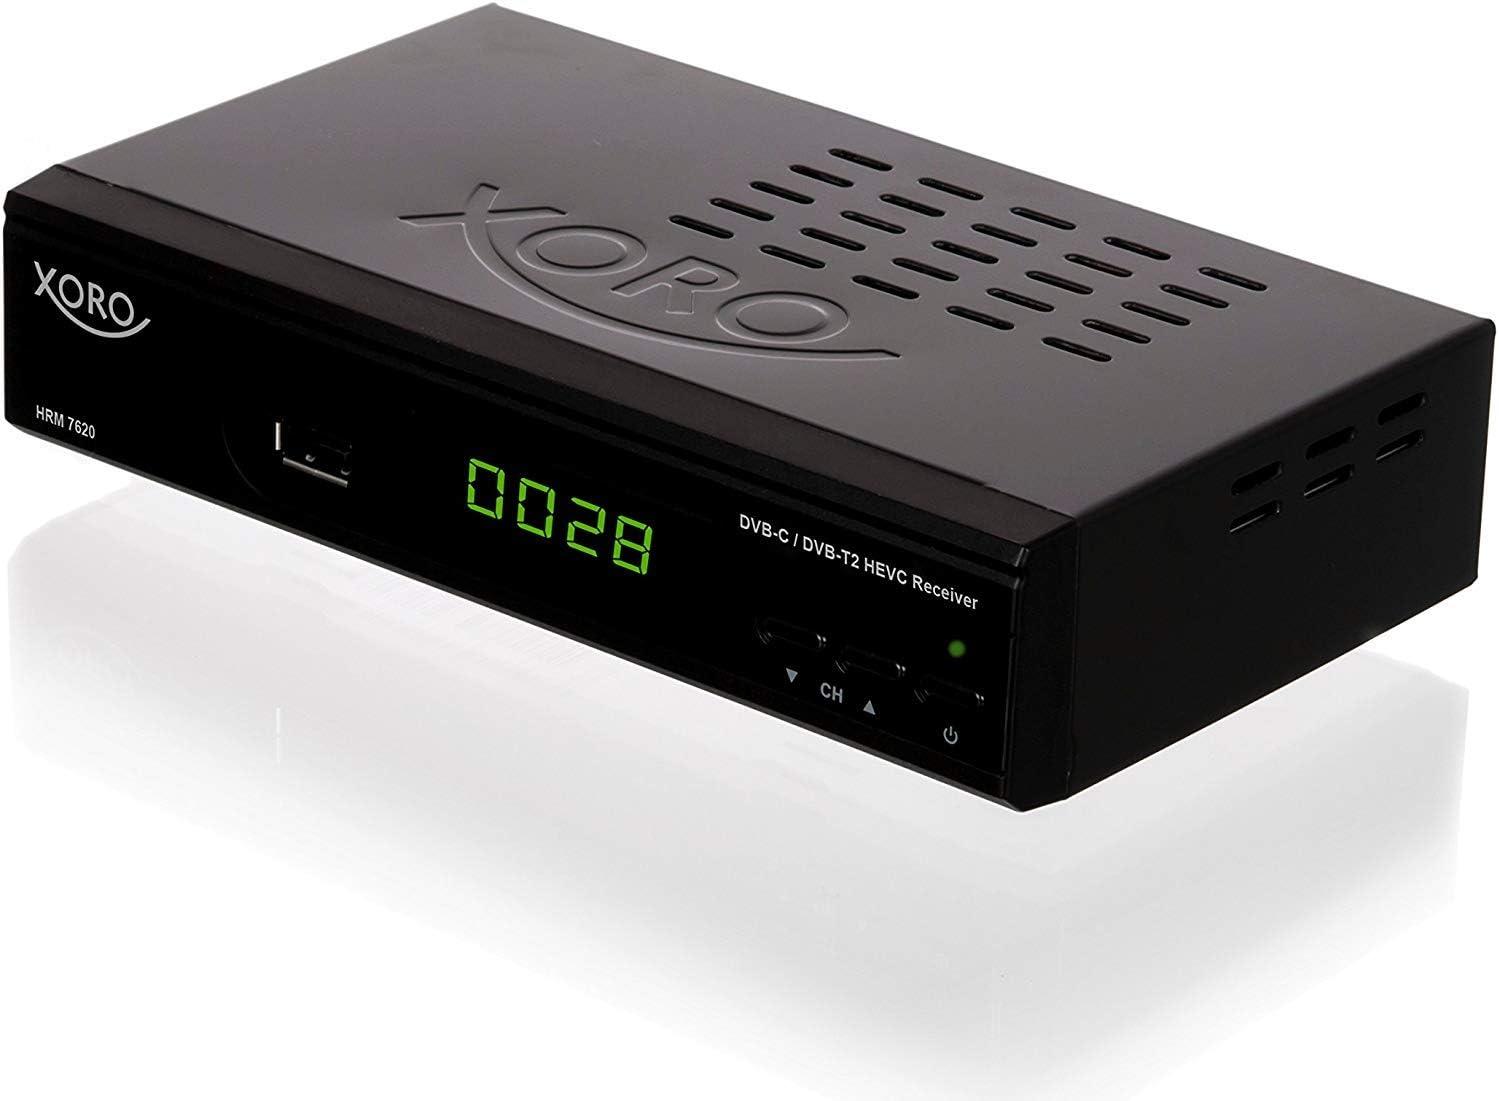 Xoro HRM 7620 Ricevitore digitale terrestre DVBT2 FullHD